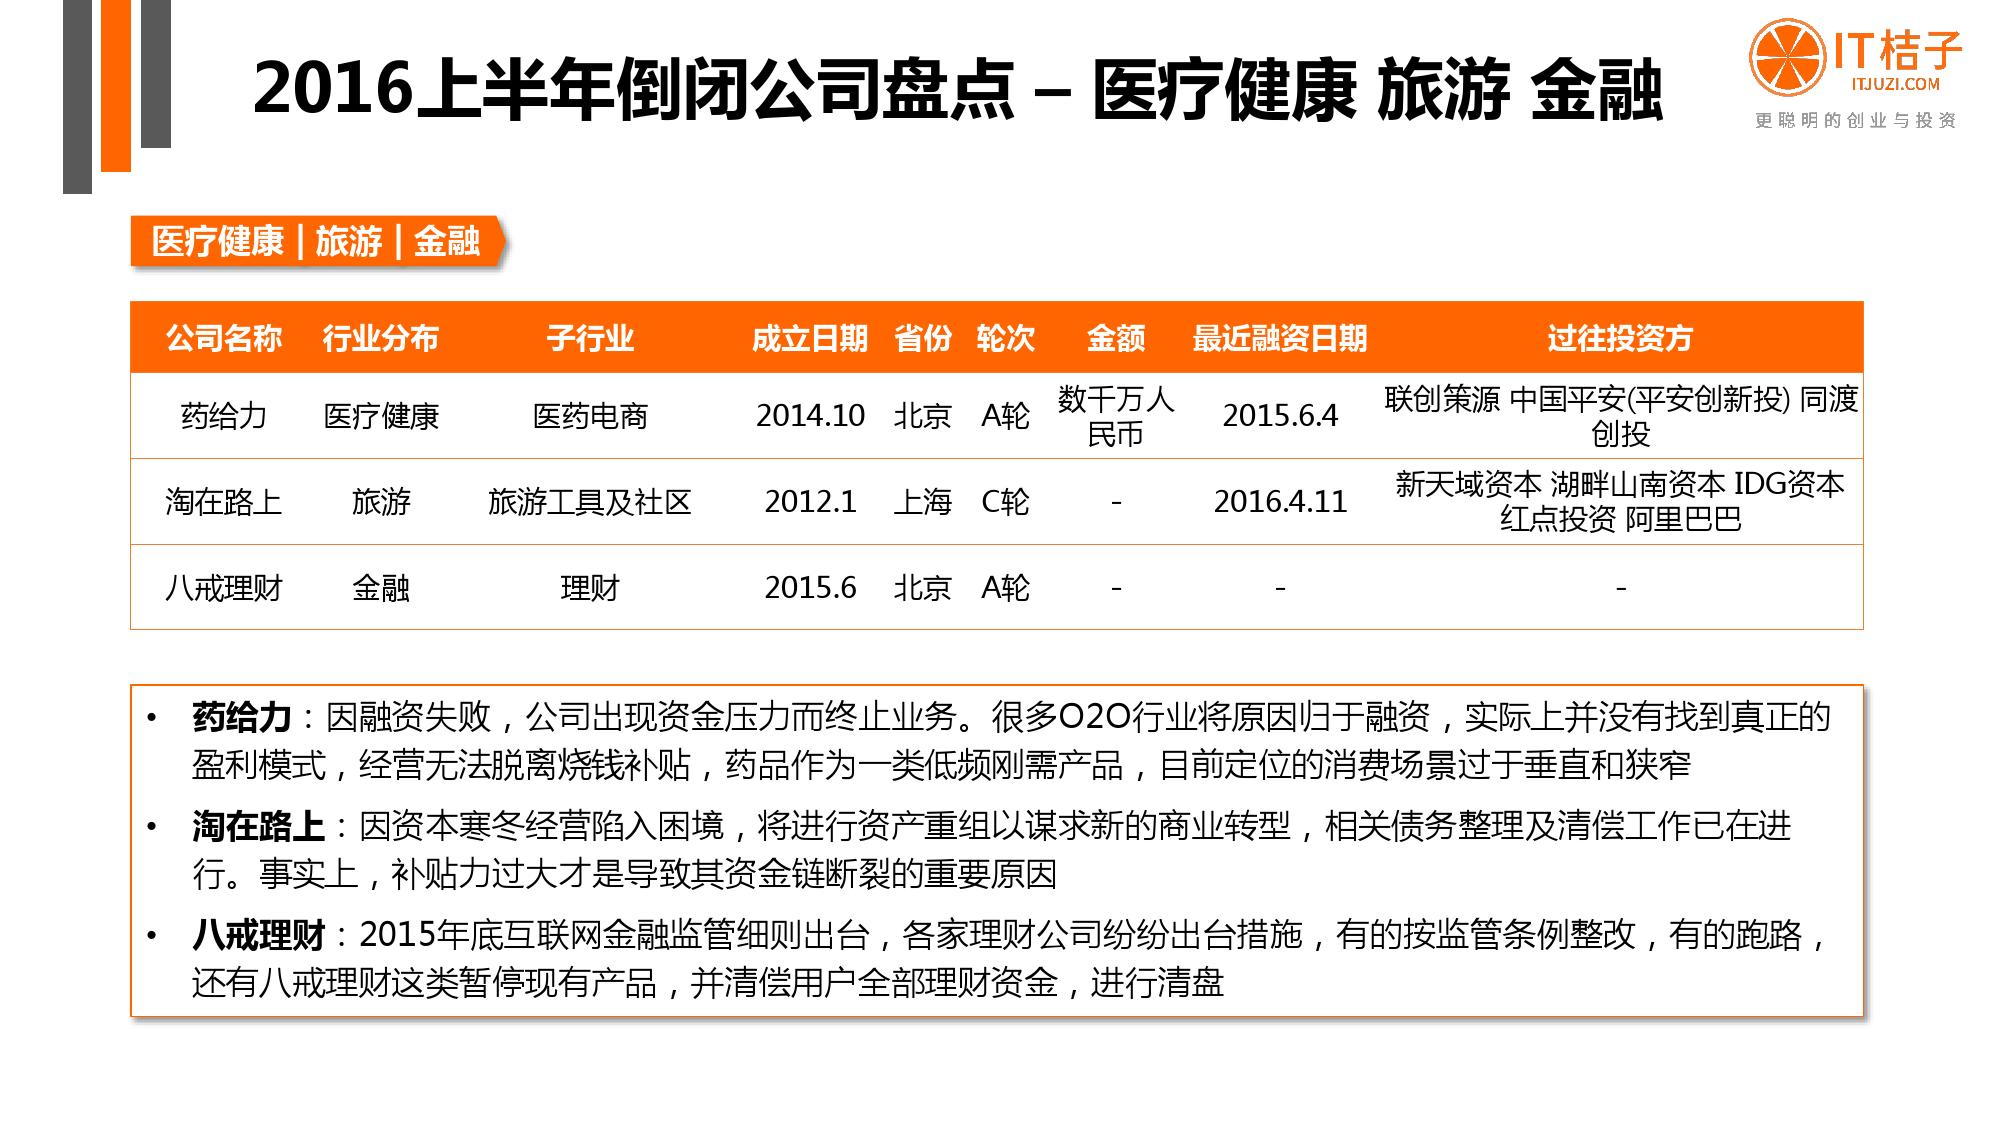 【IT桔子】2016年Q2中国互联网创业投资分析报告_000061